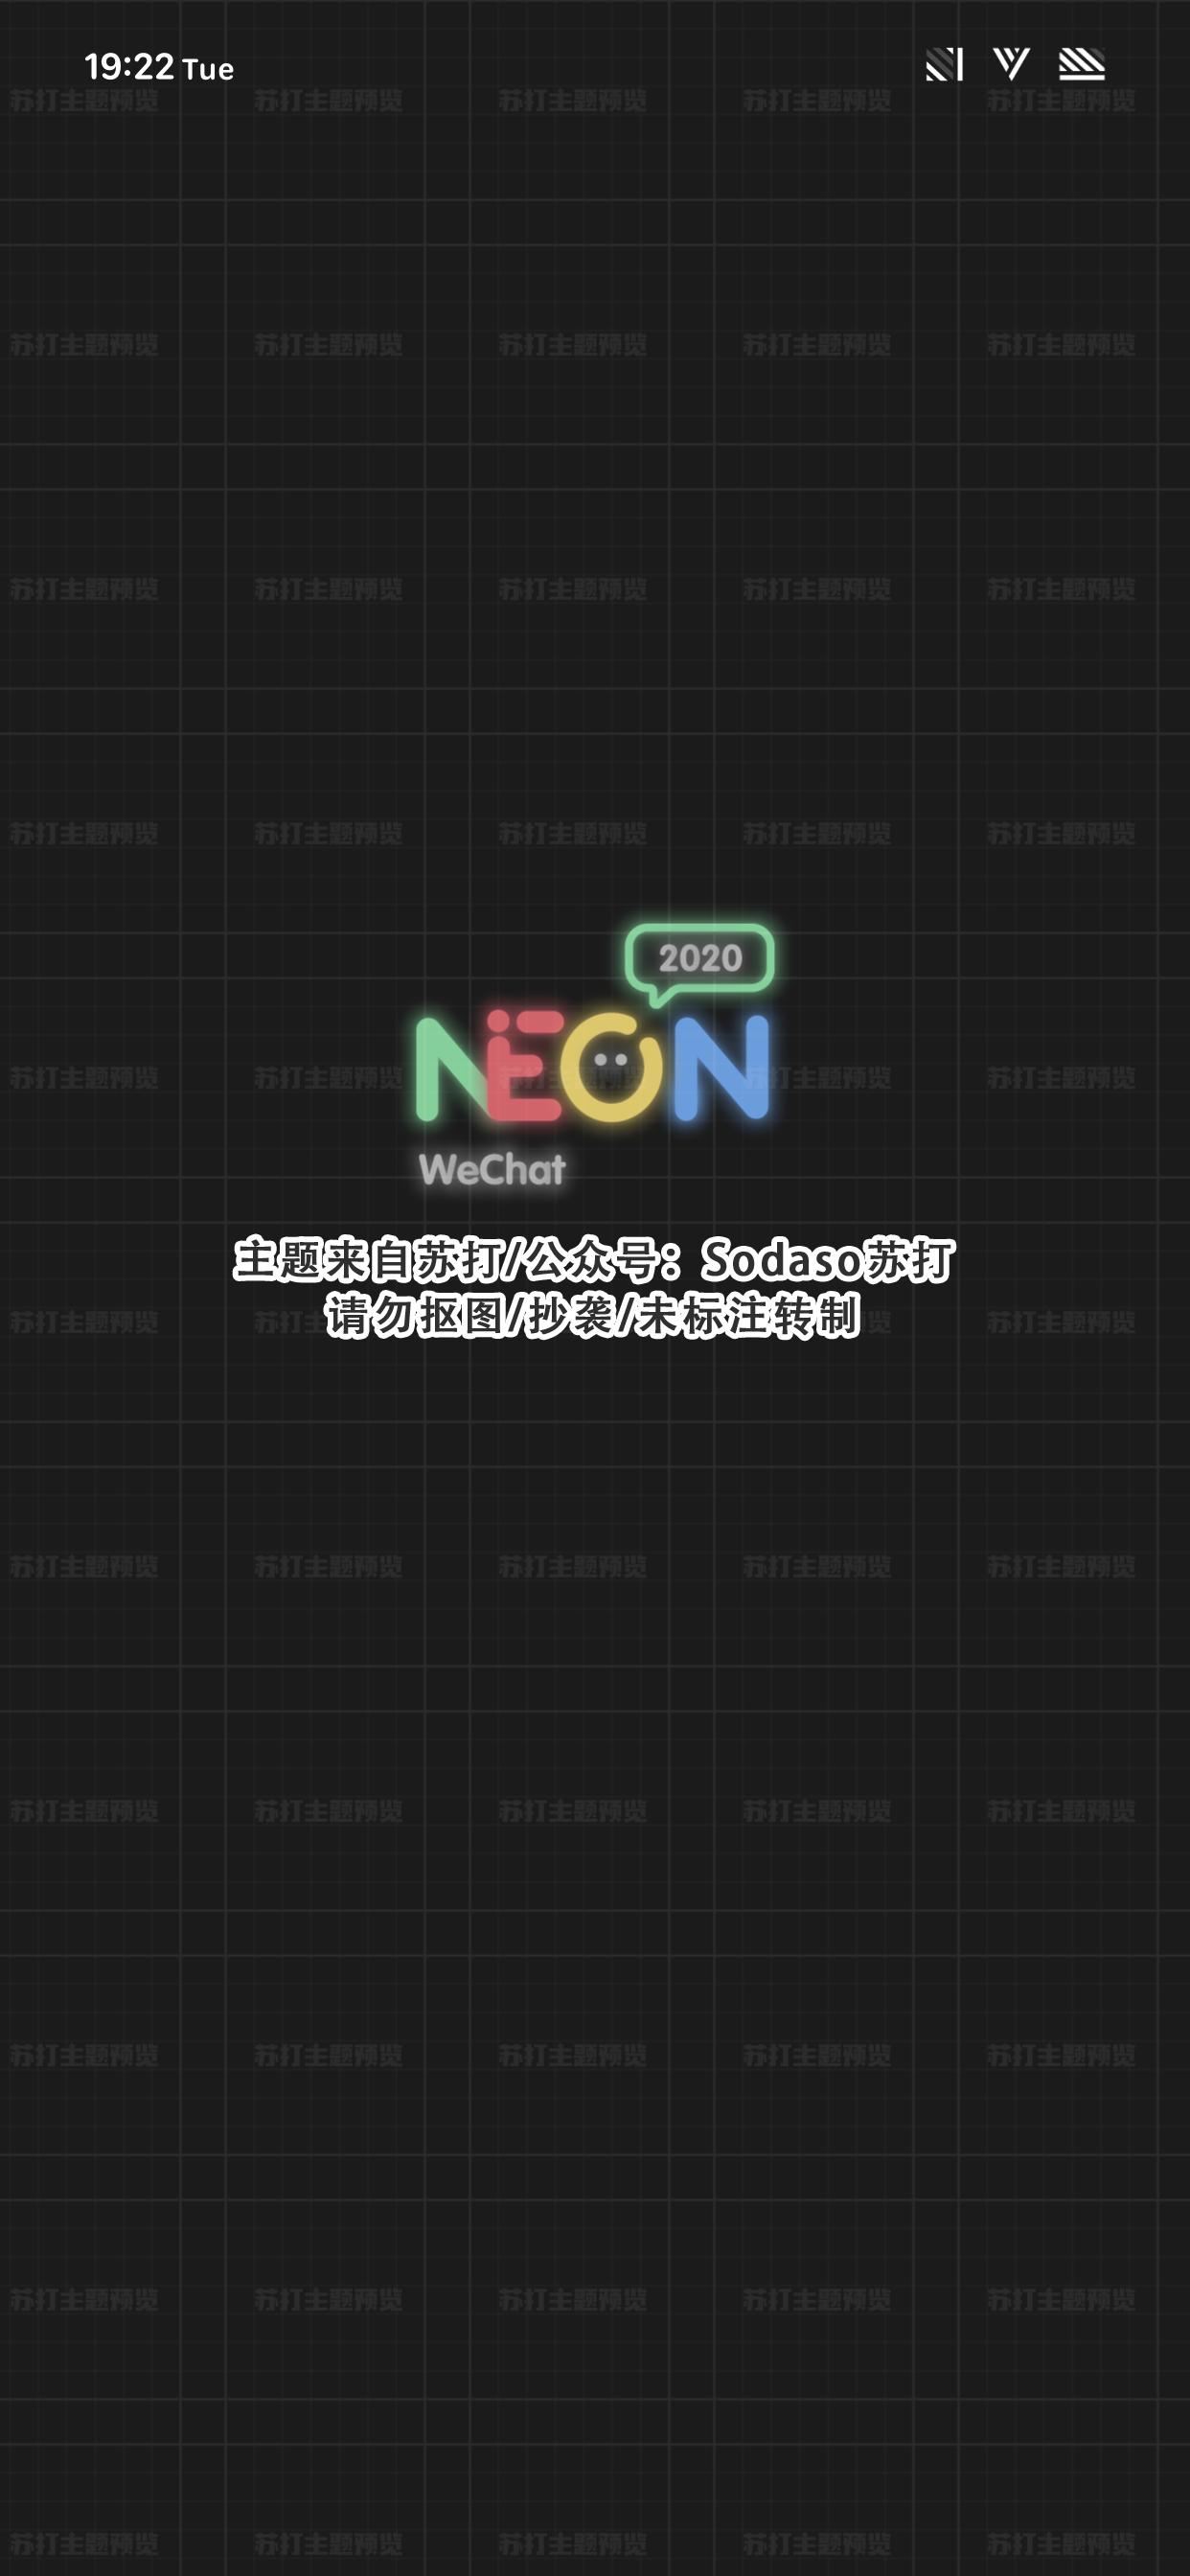 Neon2020-Dark WeChatTheme(暗黑版微信主题) - 1.04